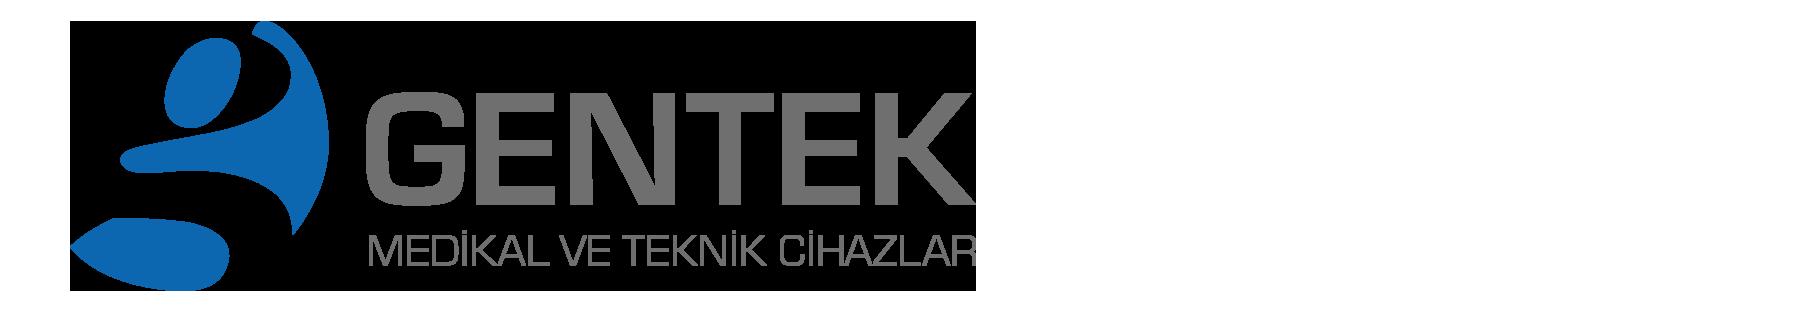 Gentek Medical